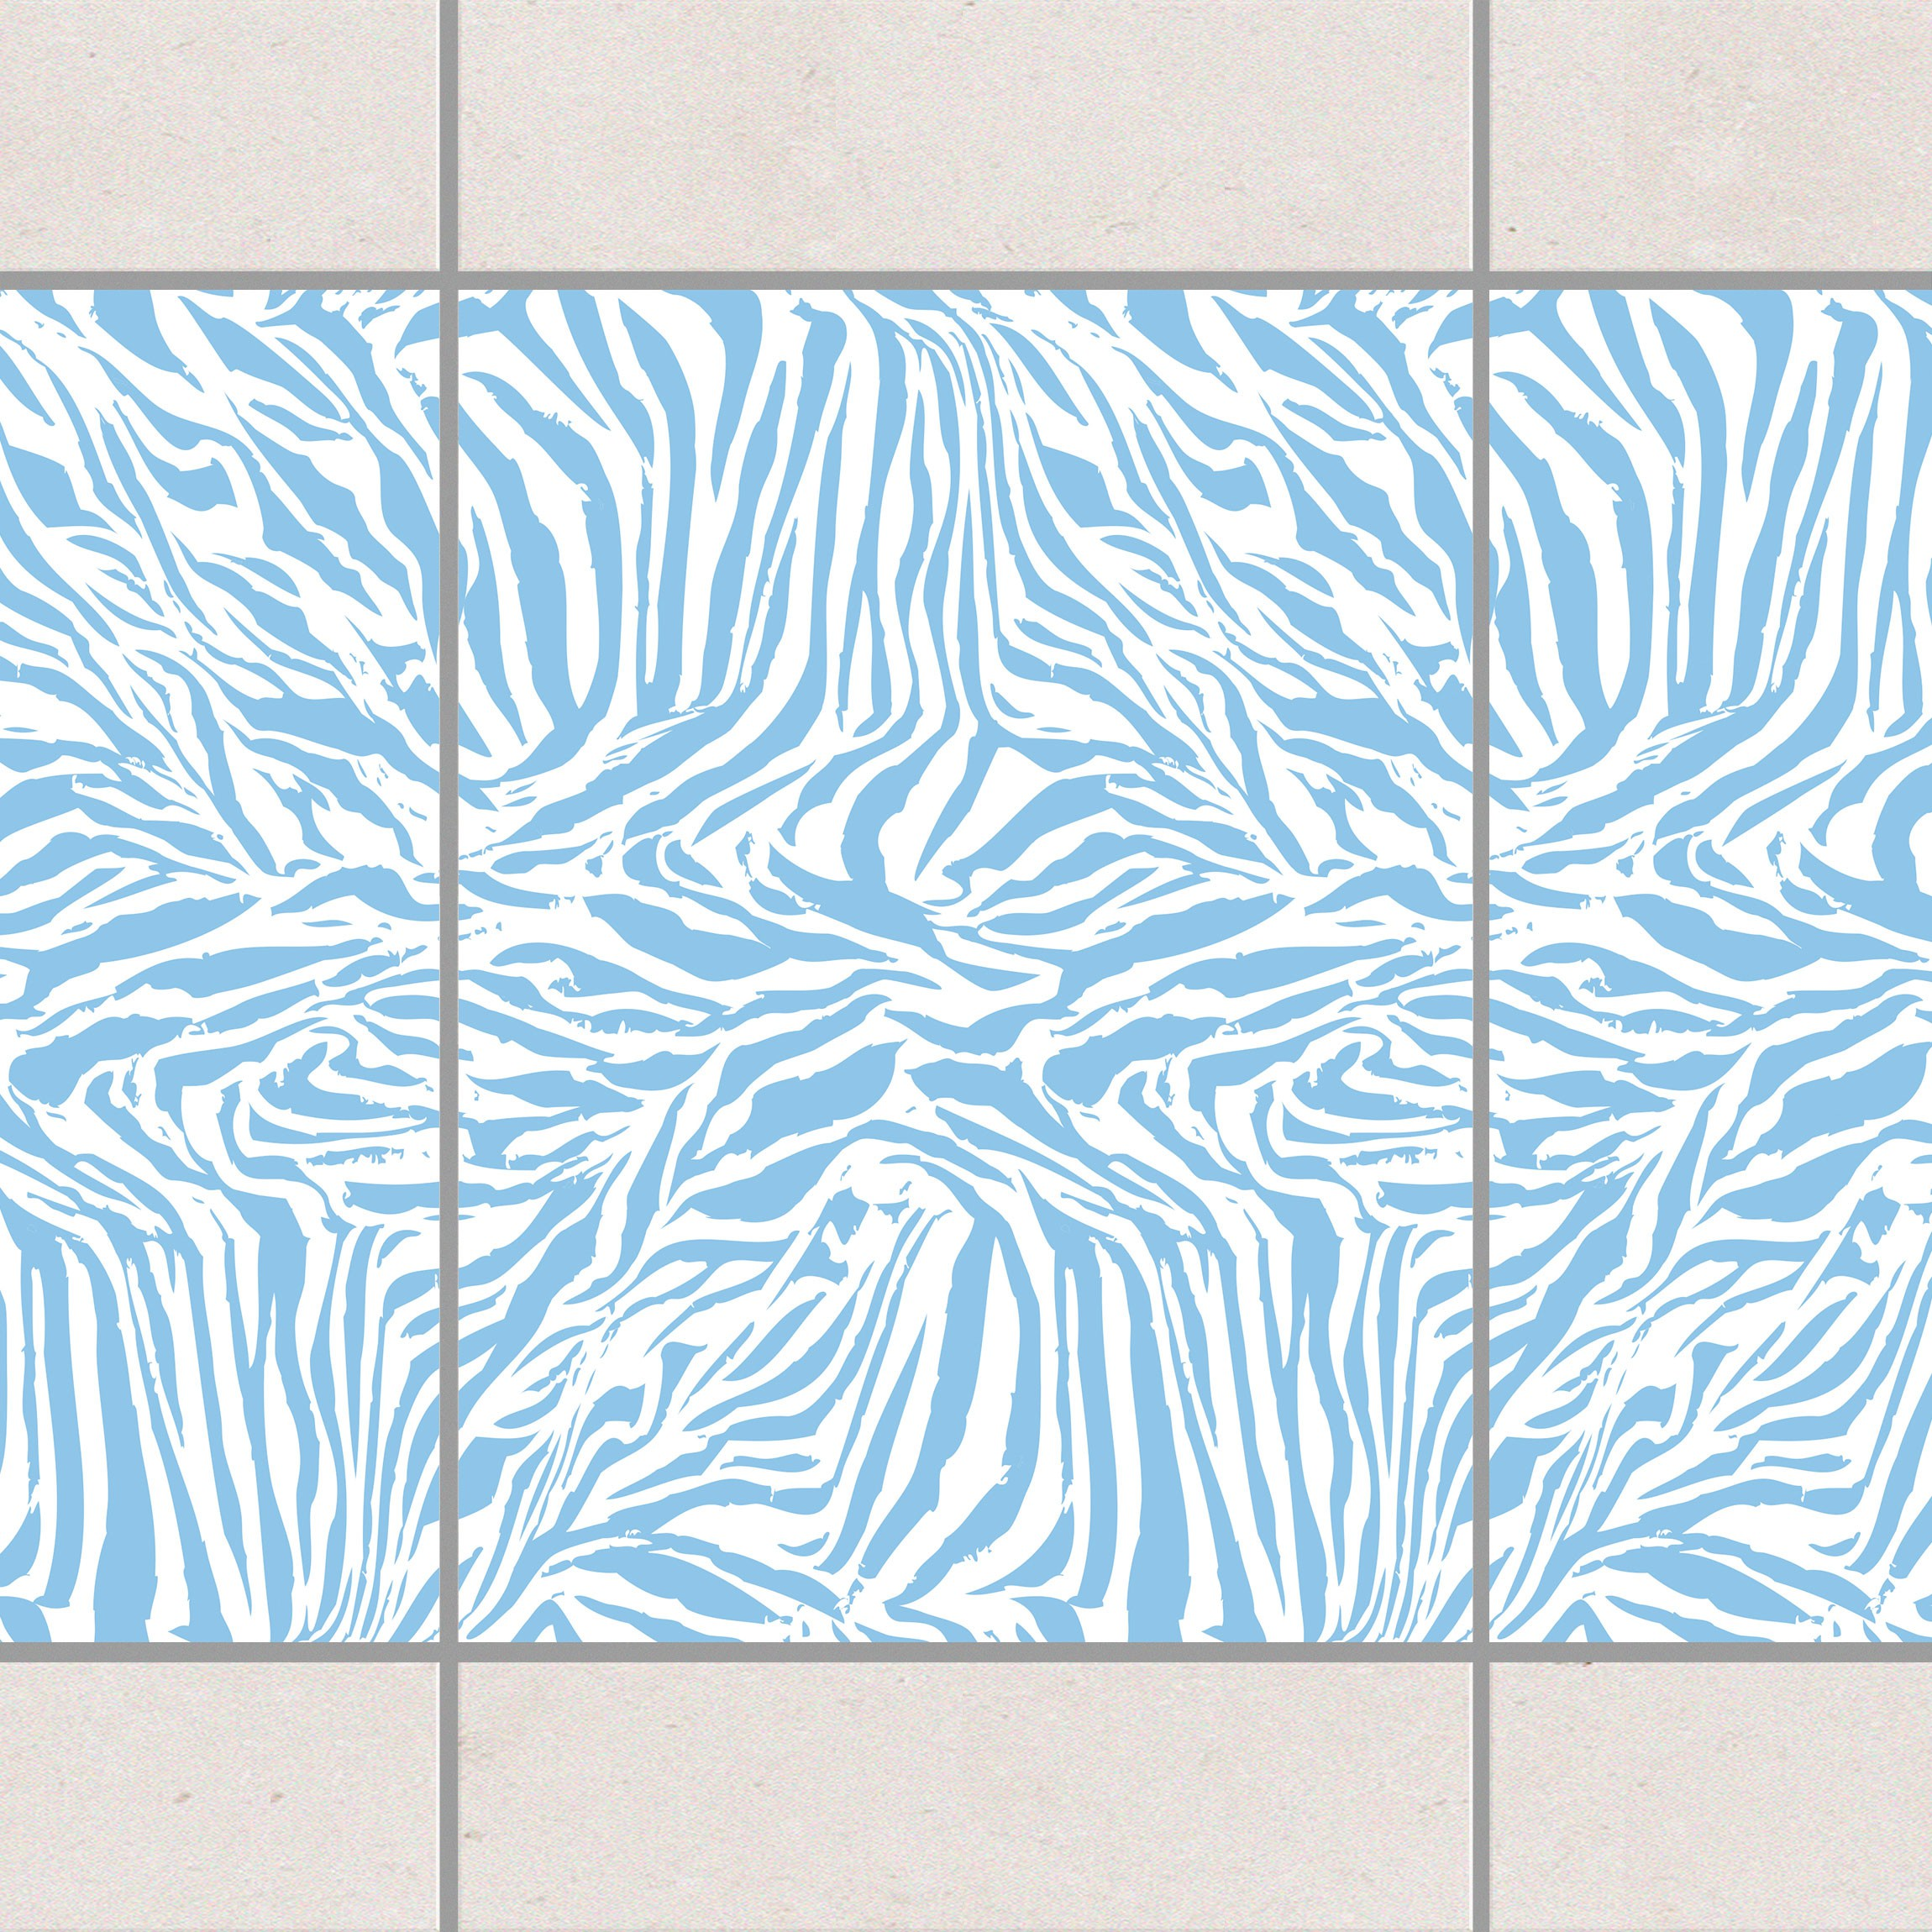 fliesen bord re zebra design light blue 20x15 cm fliesenaufkleber blau. Black Bedroom Furniture Sets. Home Design Ideas